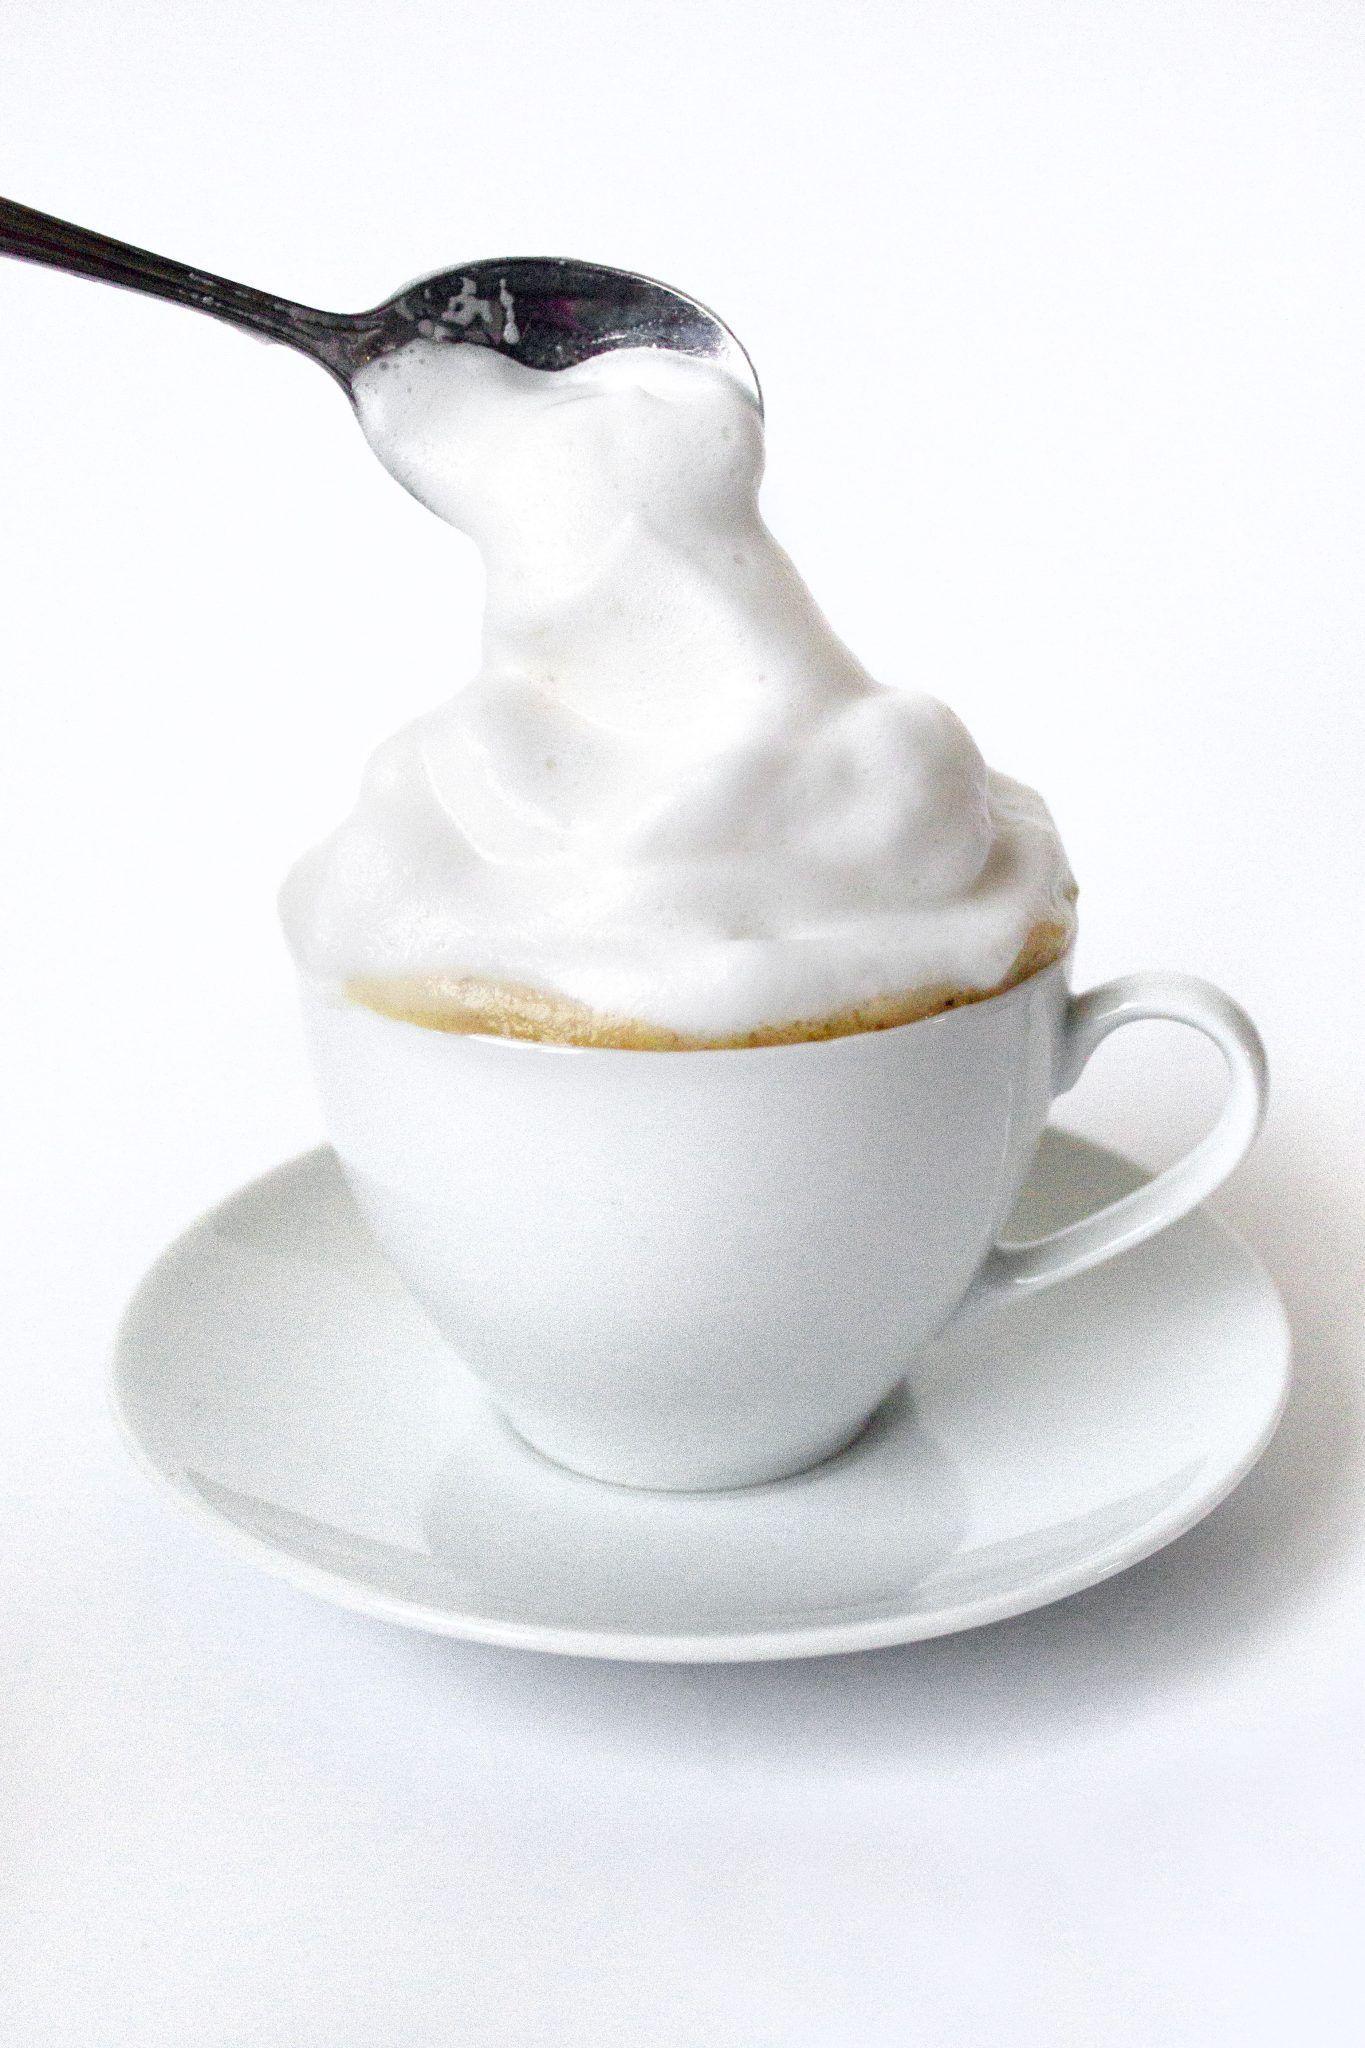 Howto make an easy almond milk cappuccino recipe